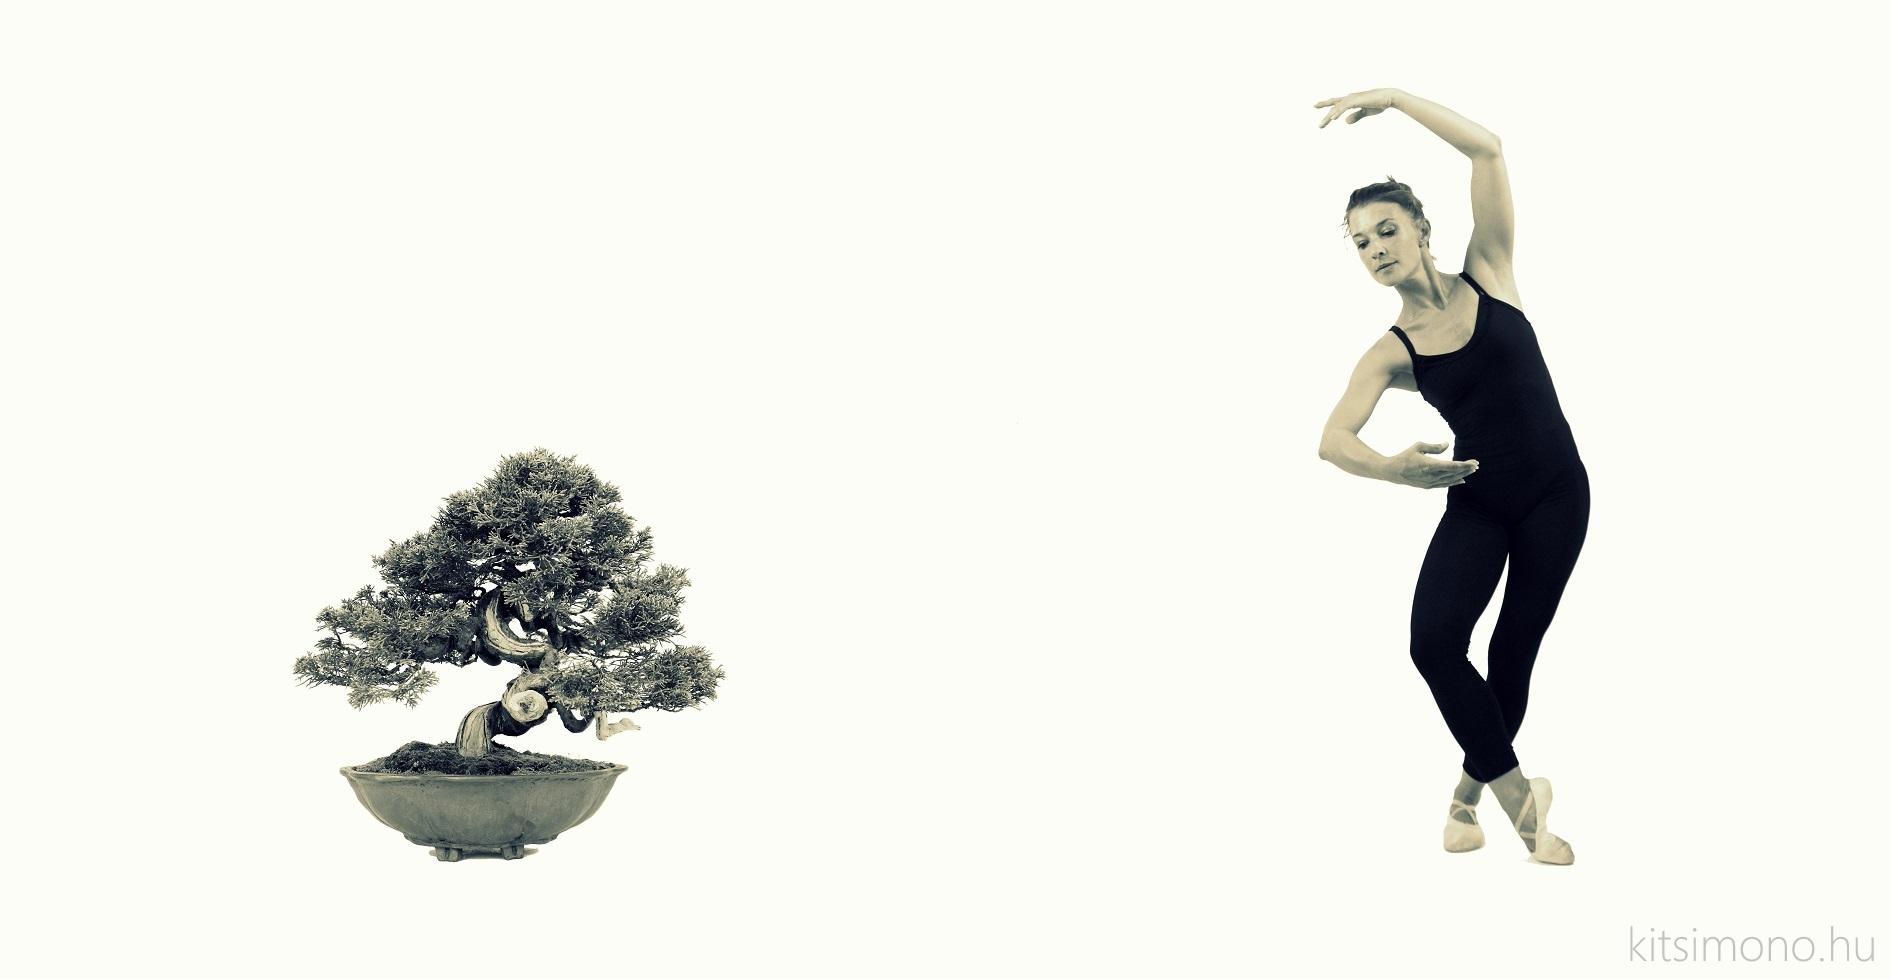 juniperus chinensis itoigawa ballet style movement kitsimono meets balet dance (2)